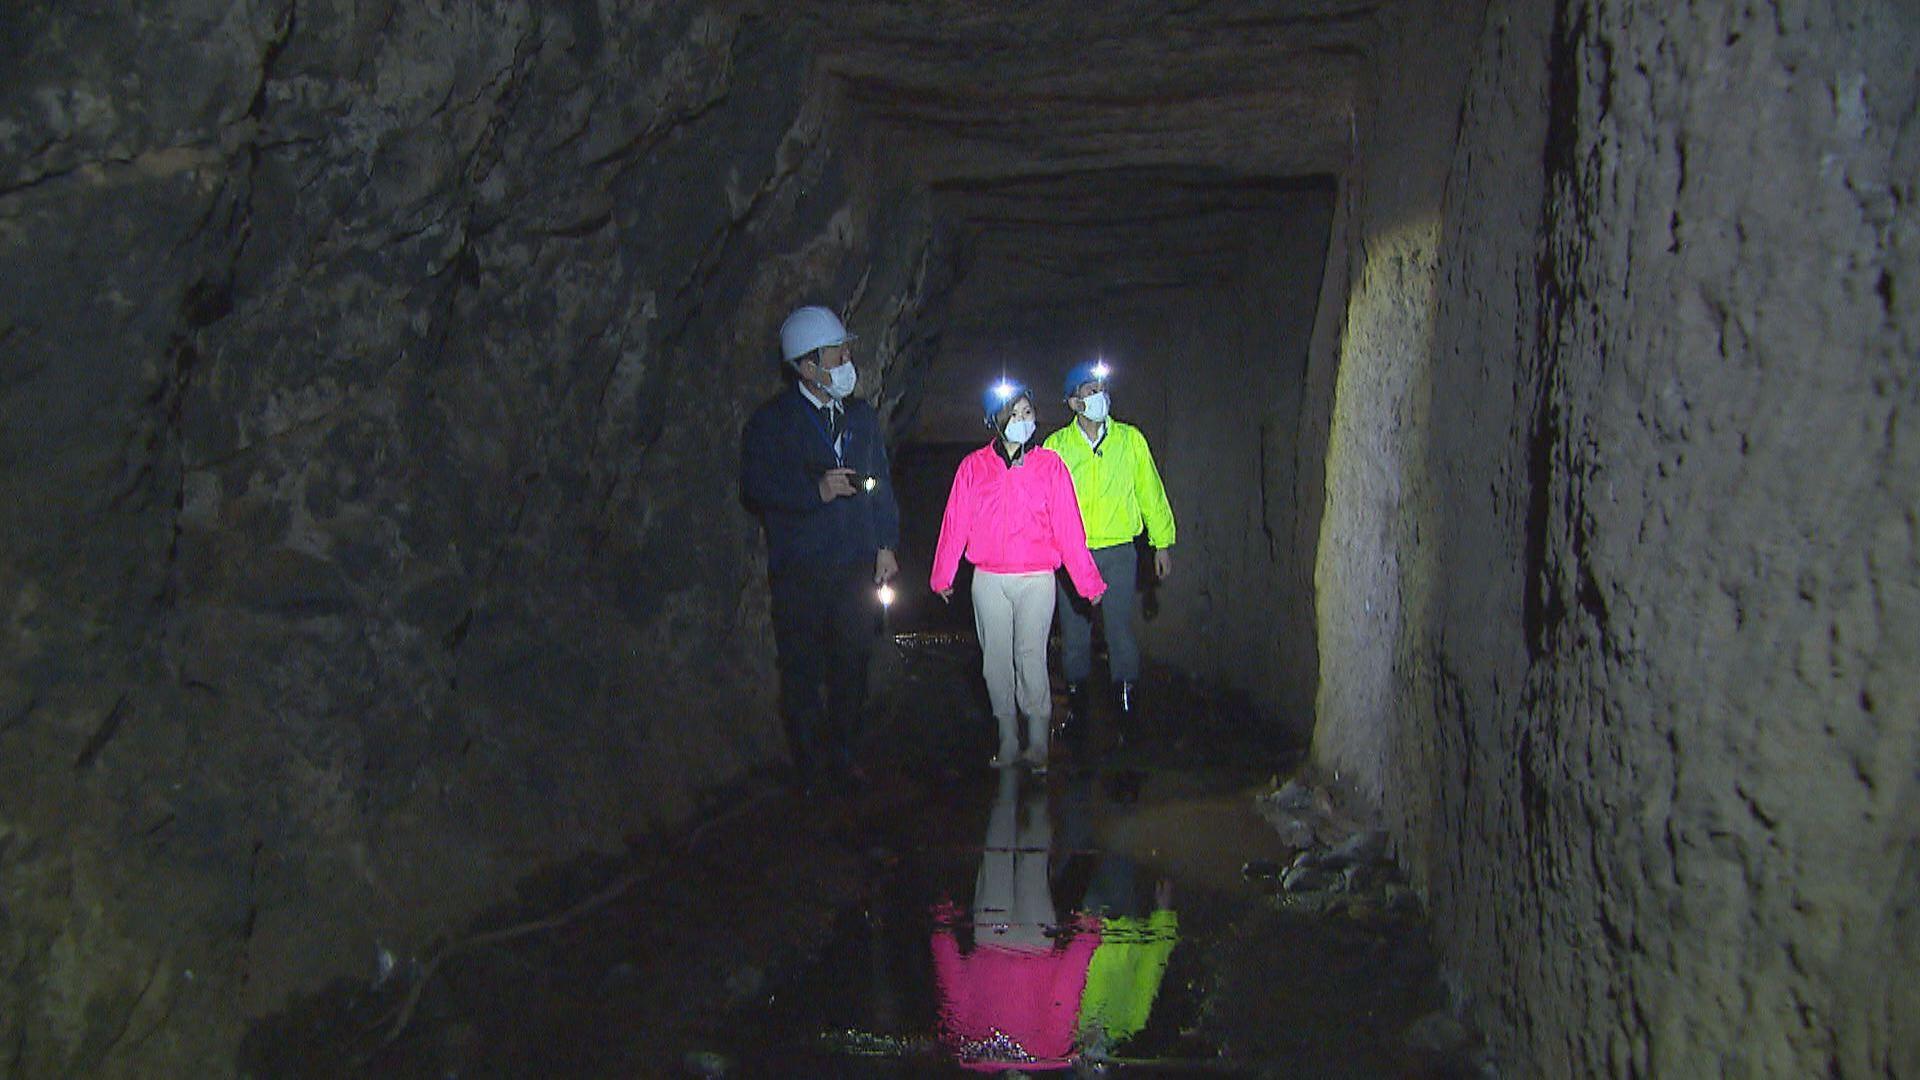 石見銀山世界遺産センター 洞窟